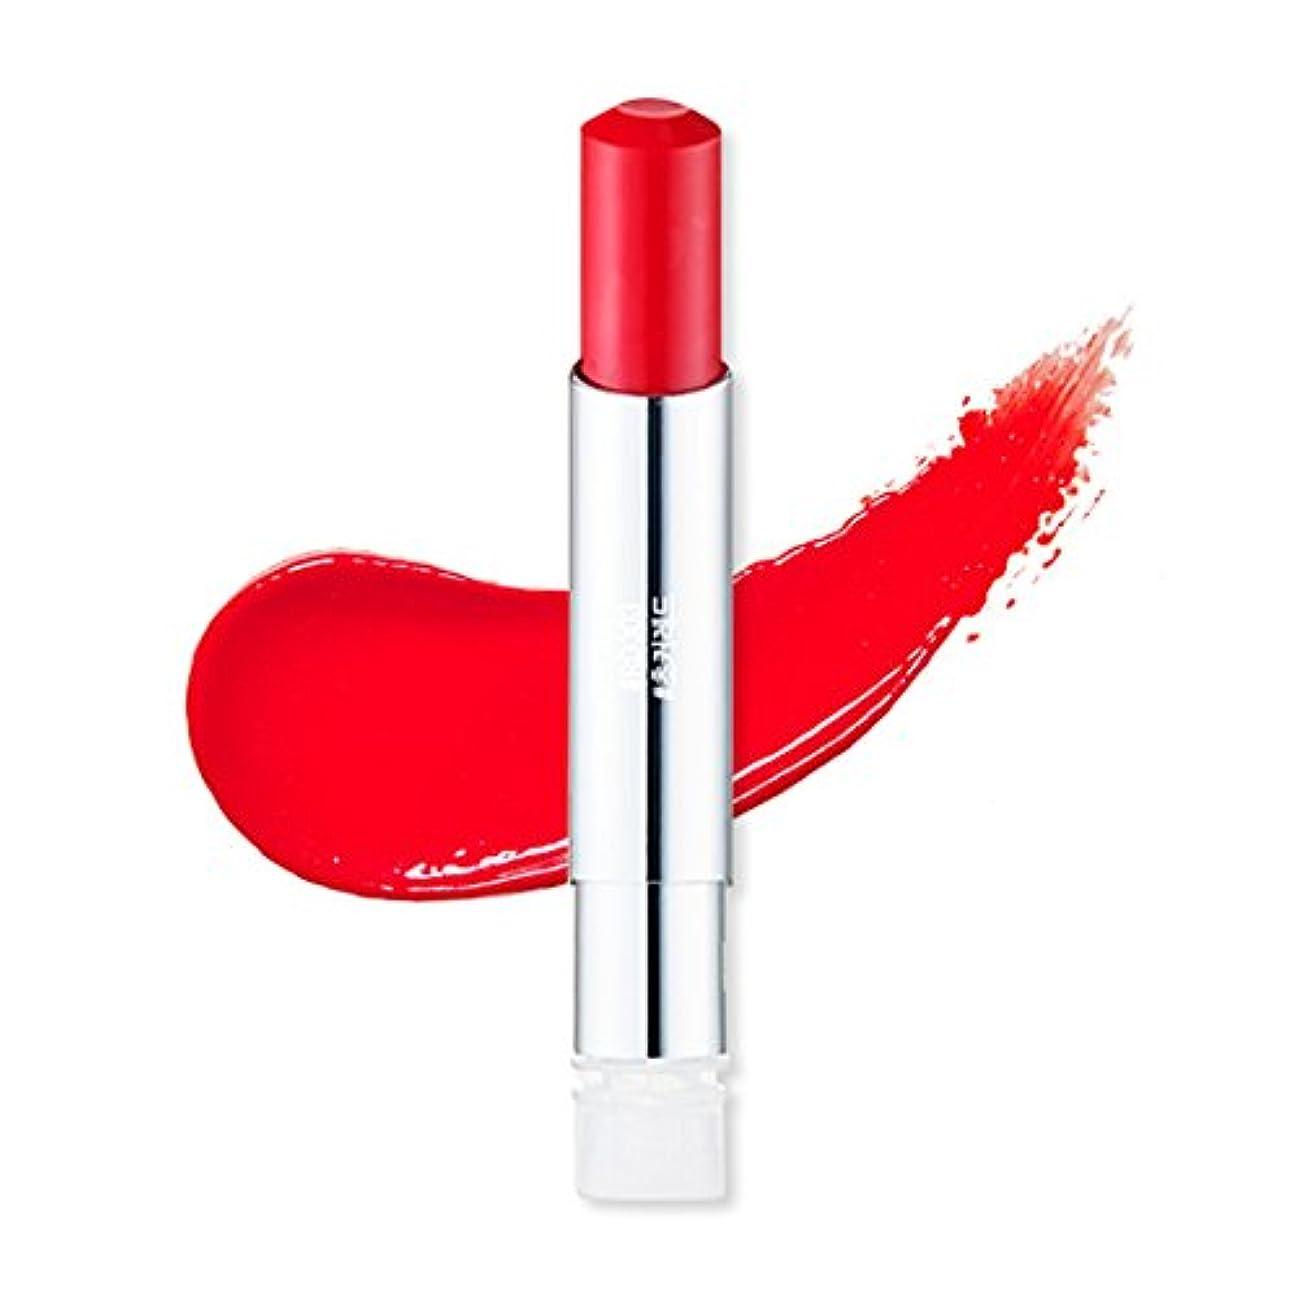 Etude House Glass Tinting Lips Talk #RD303 エチュードハウスグラスチンチンリップトーク #RD303 [並行輸入品]